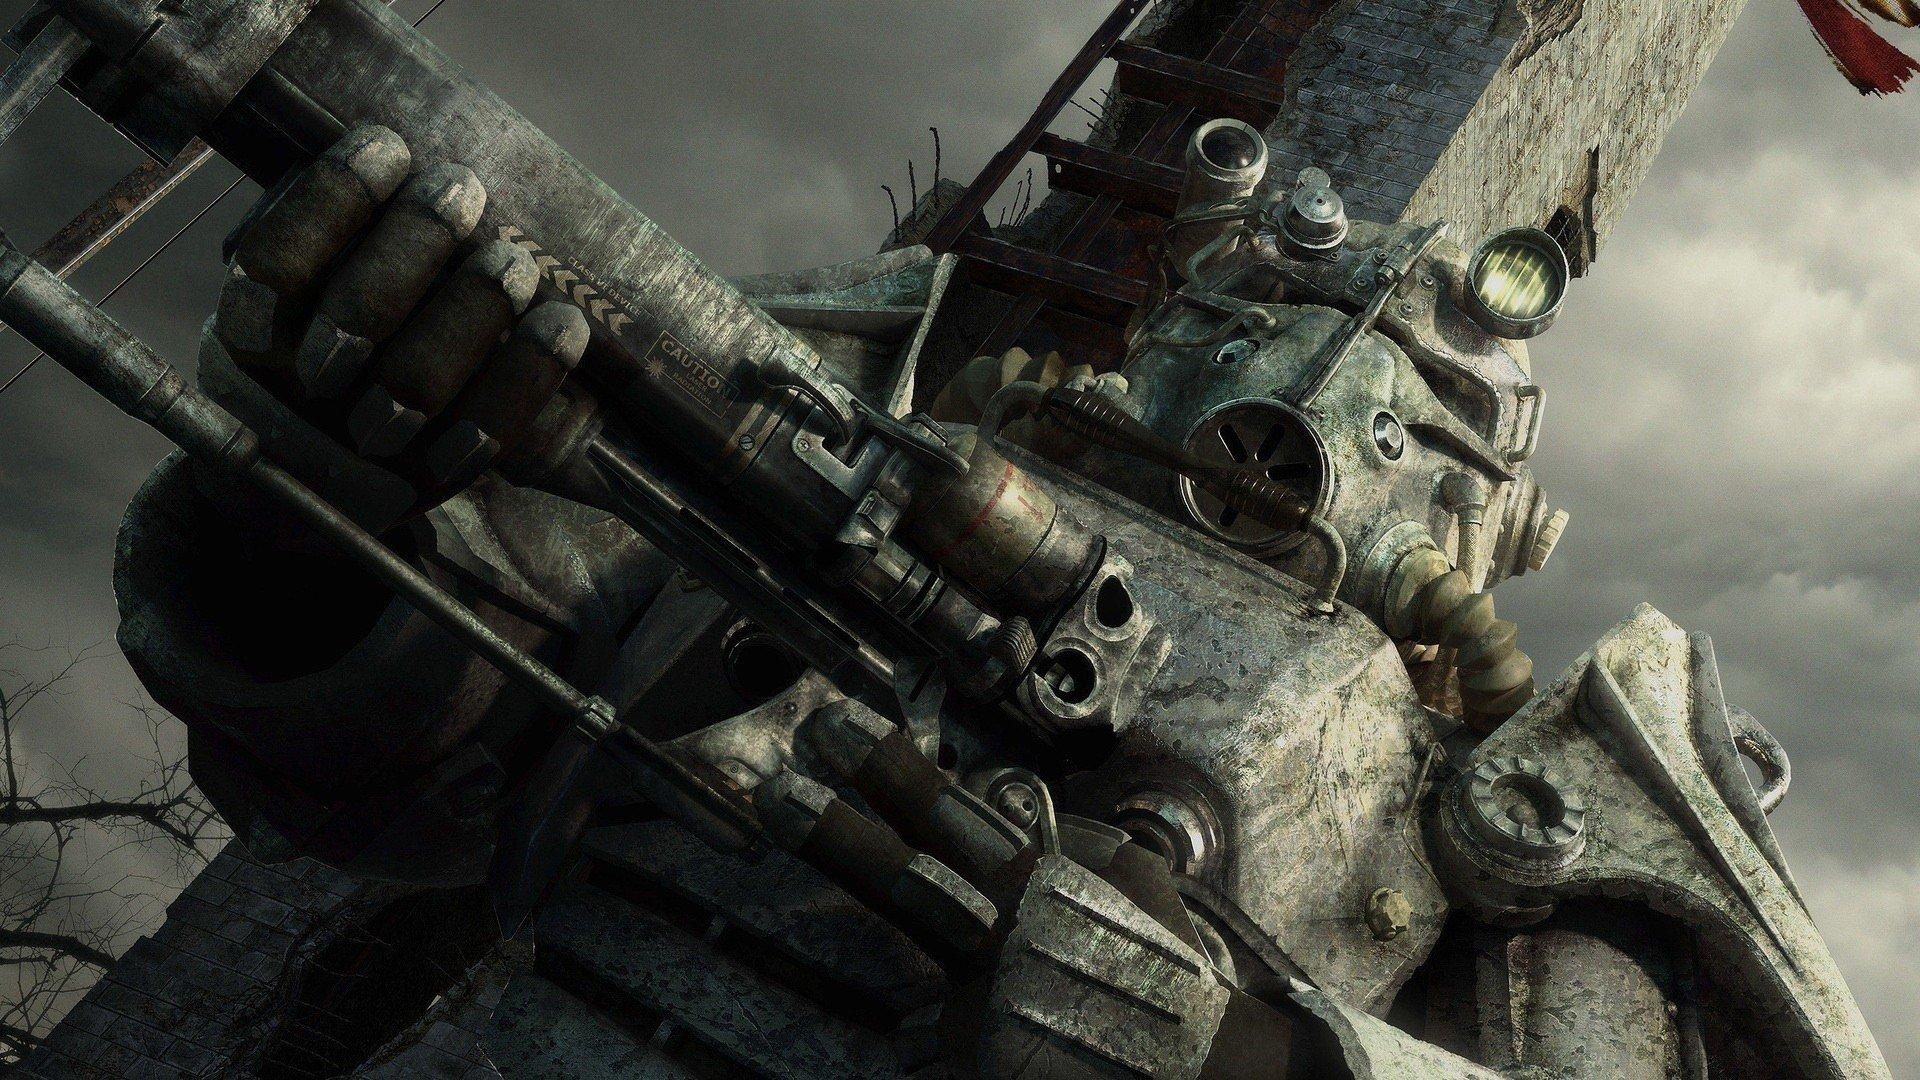 CGI Brotherhood Of Steel Fallout 3 washington monument wallpaper 1920x1080